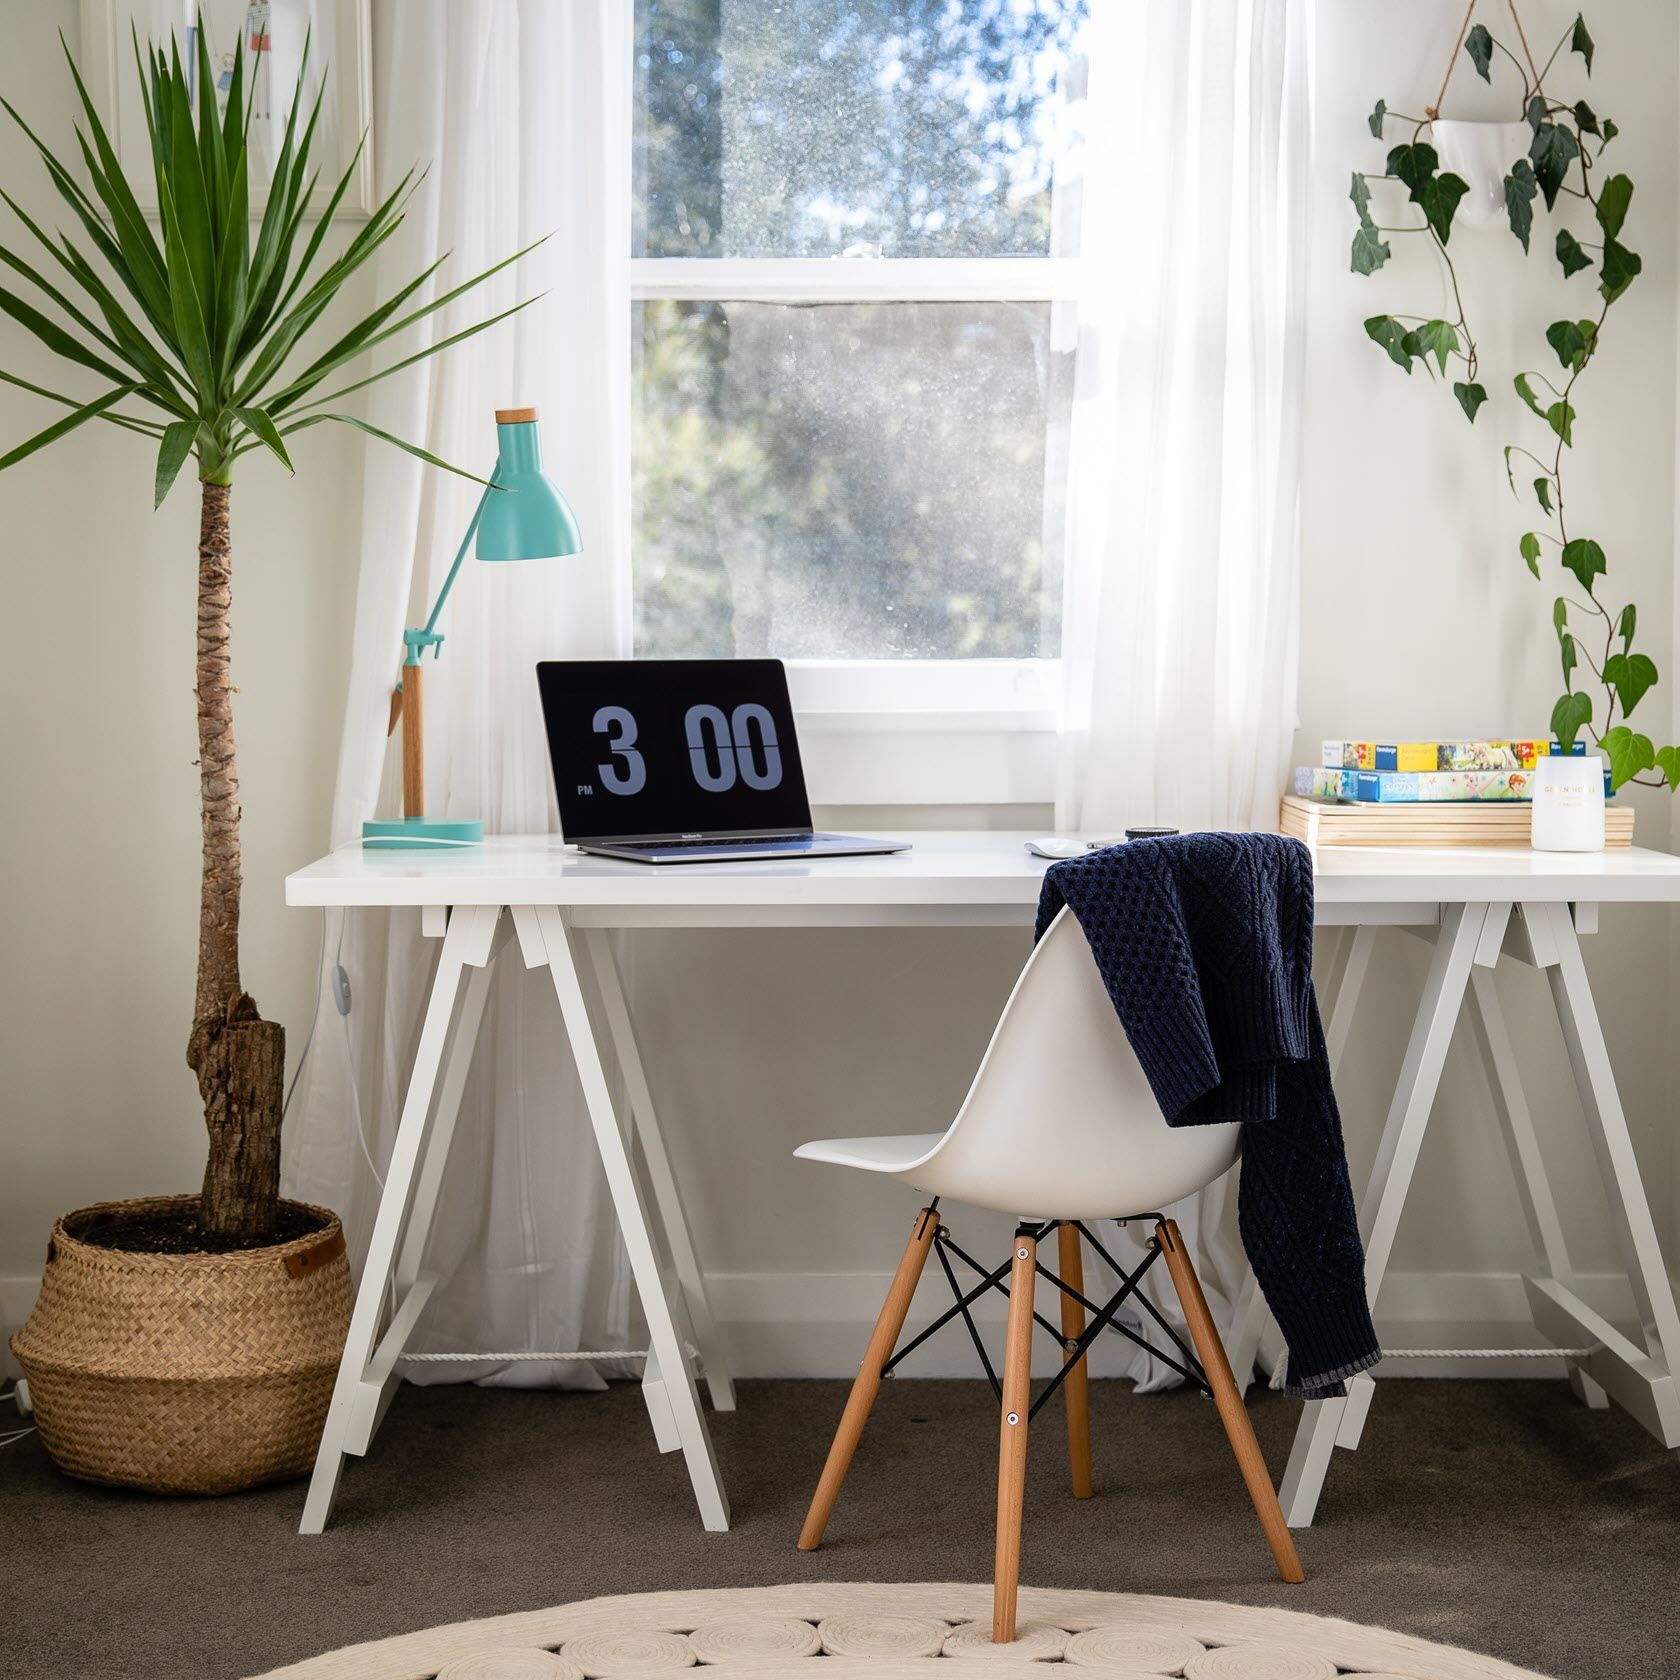 Vitra Möbel im Home Office.